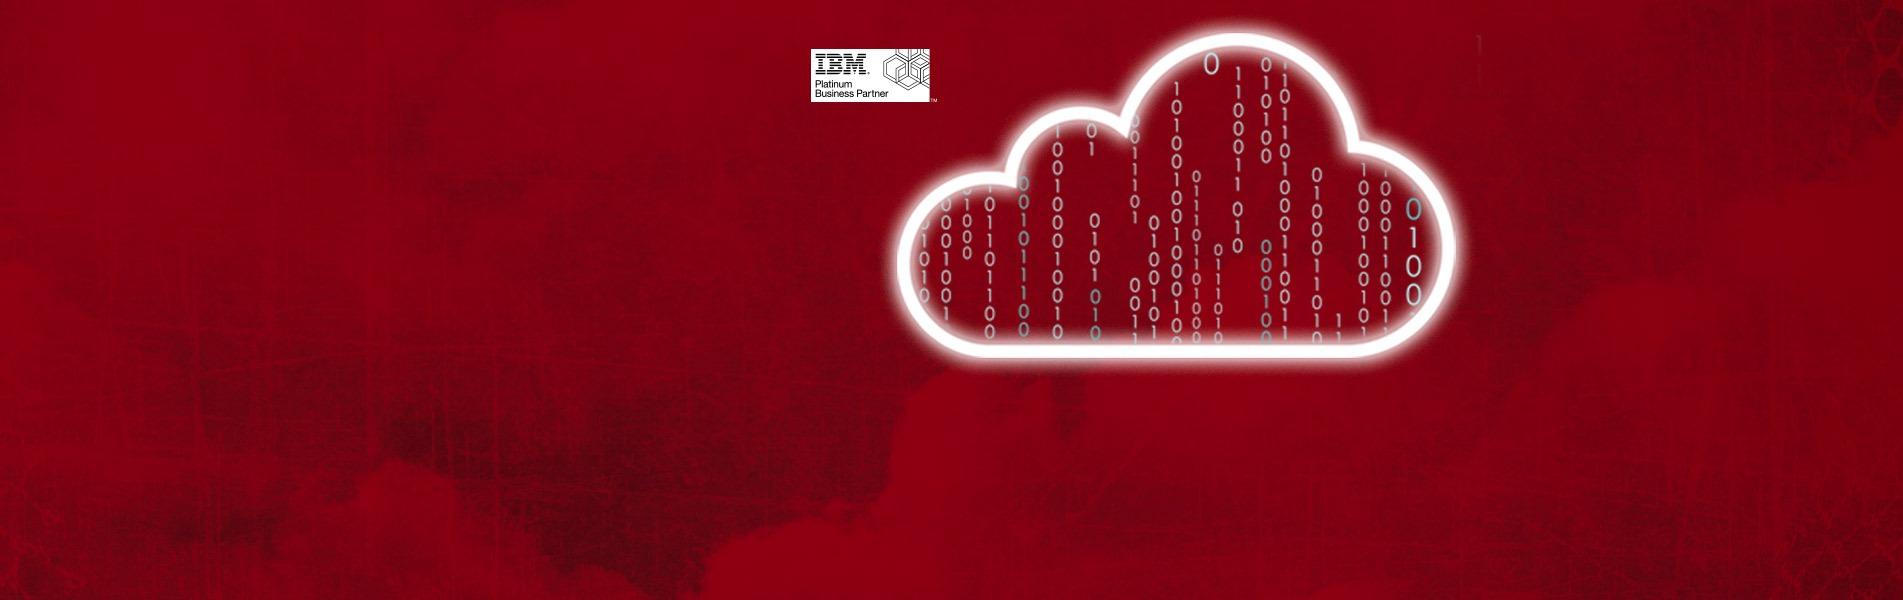 IBM SysCloud 2020